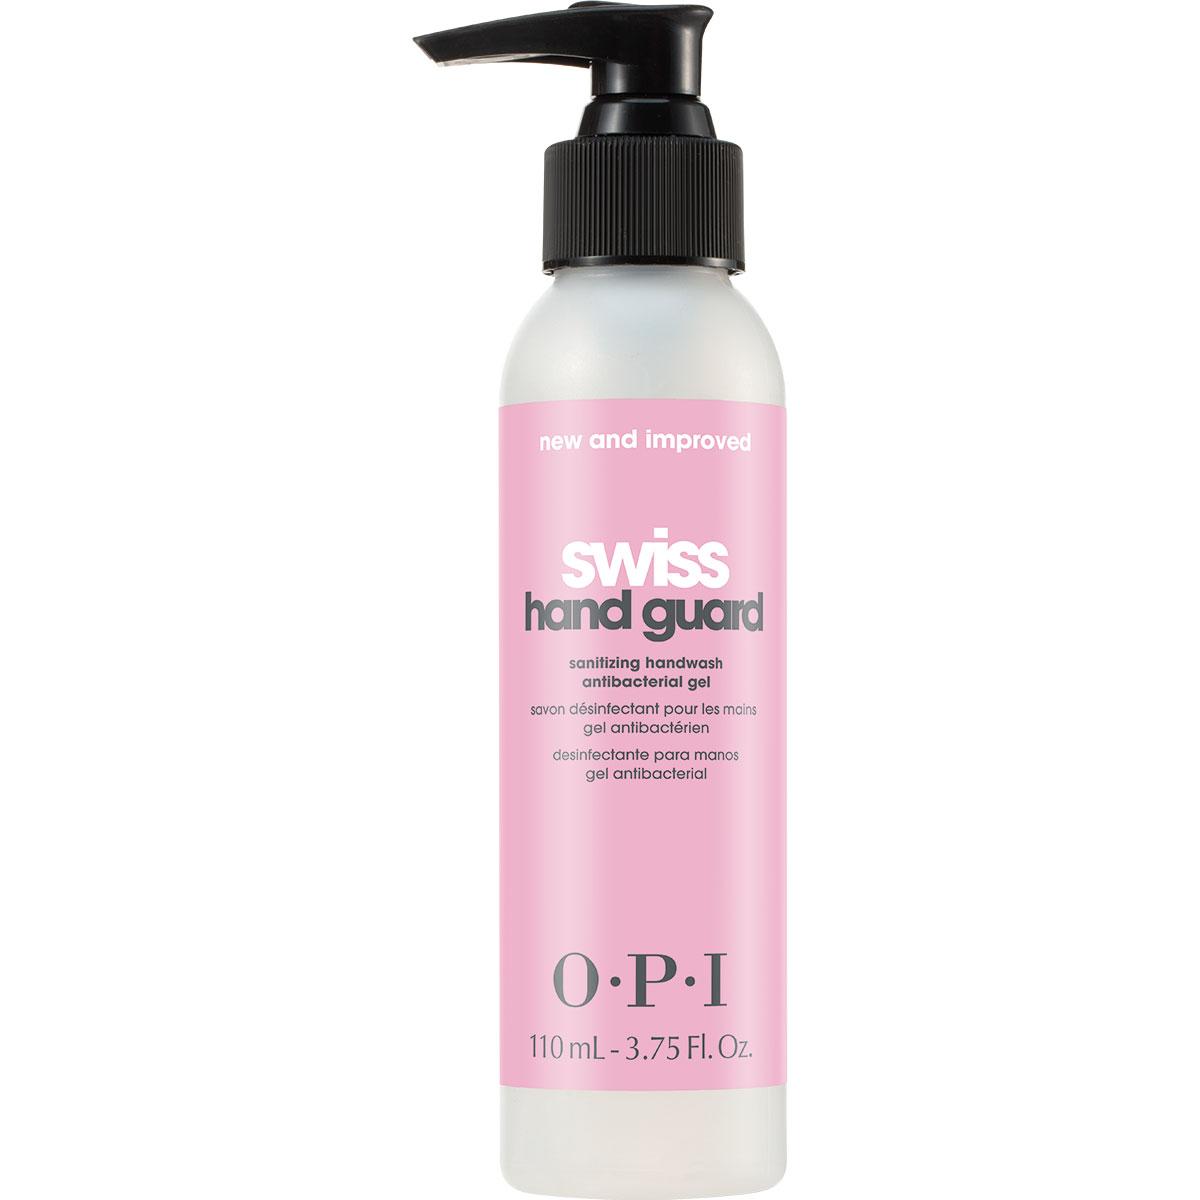 Opi Swiss Hand Guard Antiseptic Handwash Gel